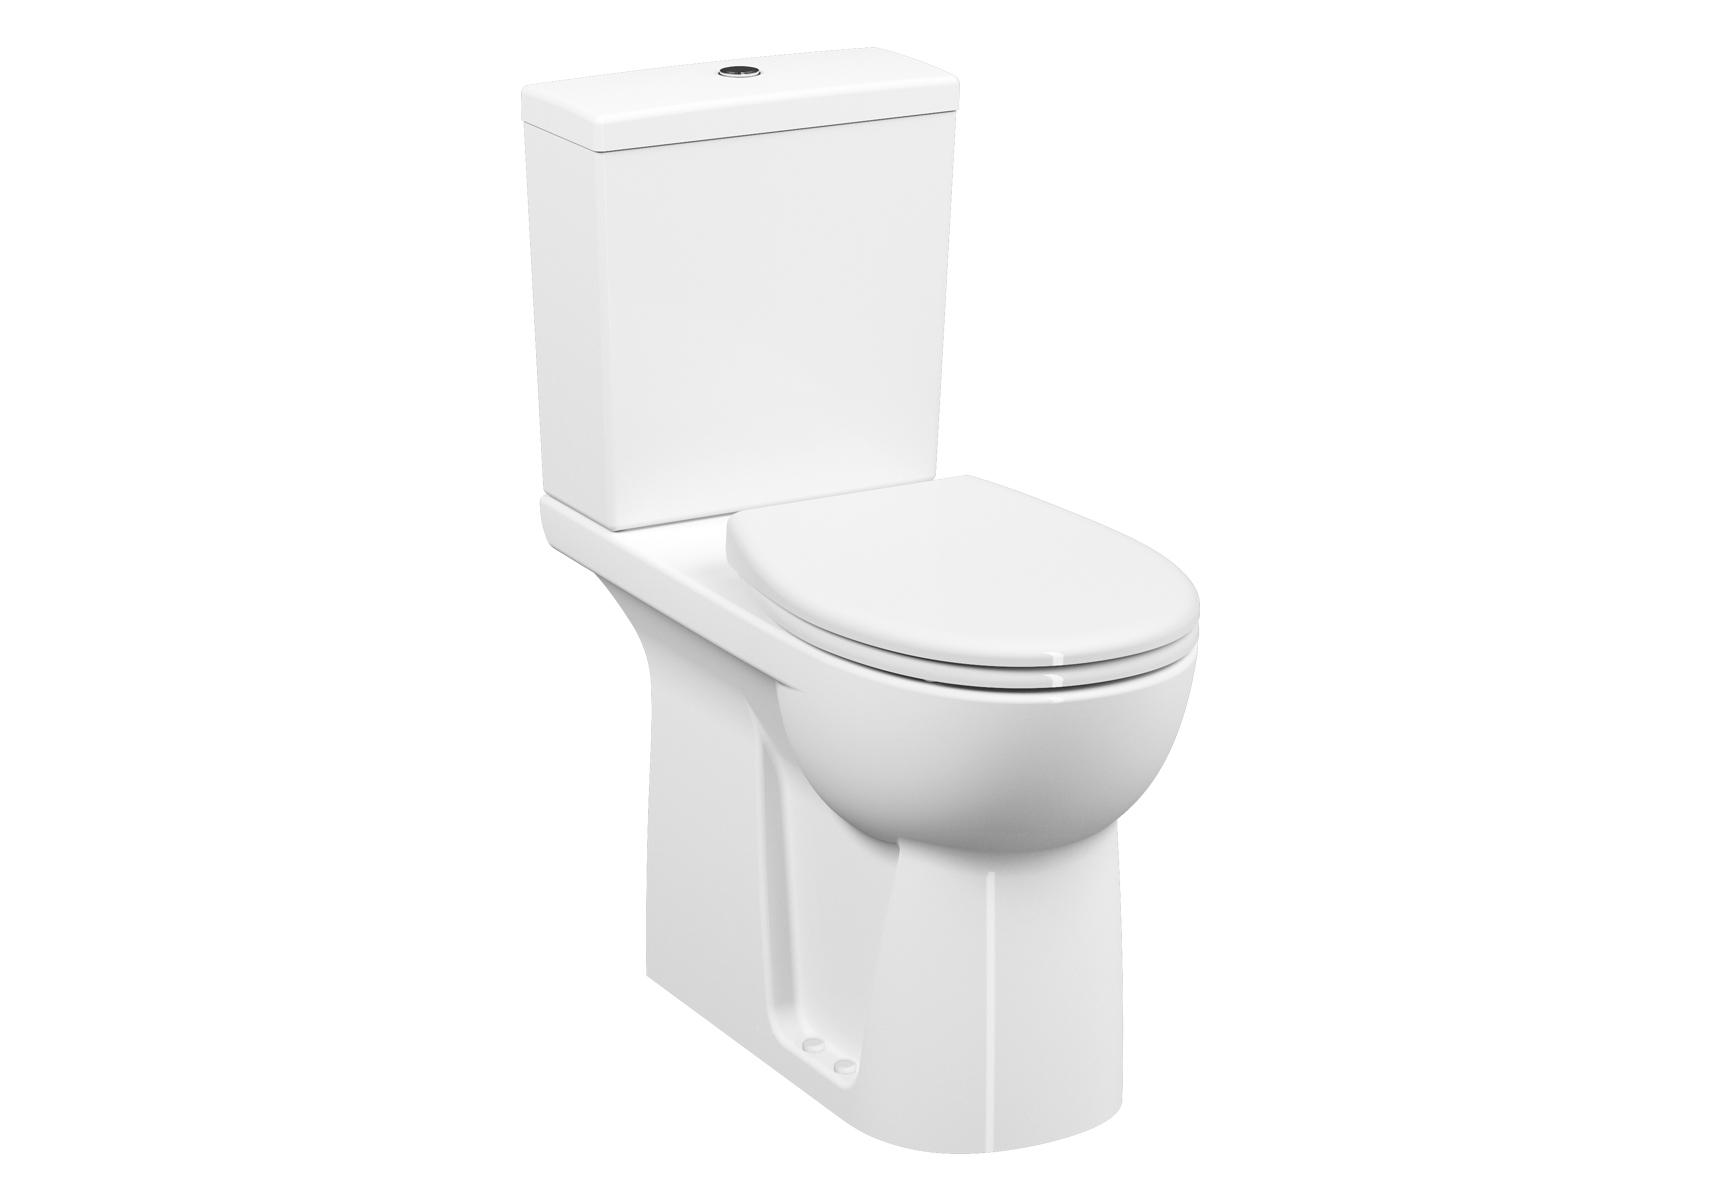 Conforma WC PMR à poser, 75 cm, fonction bidet, open back